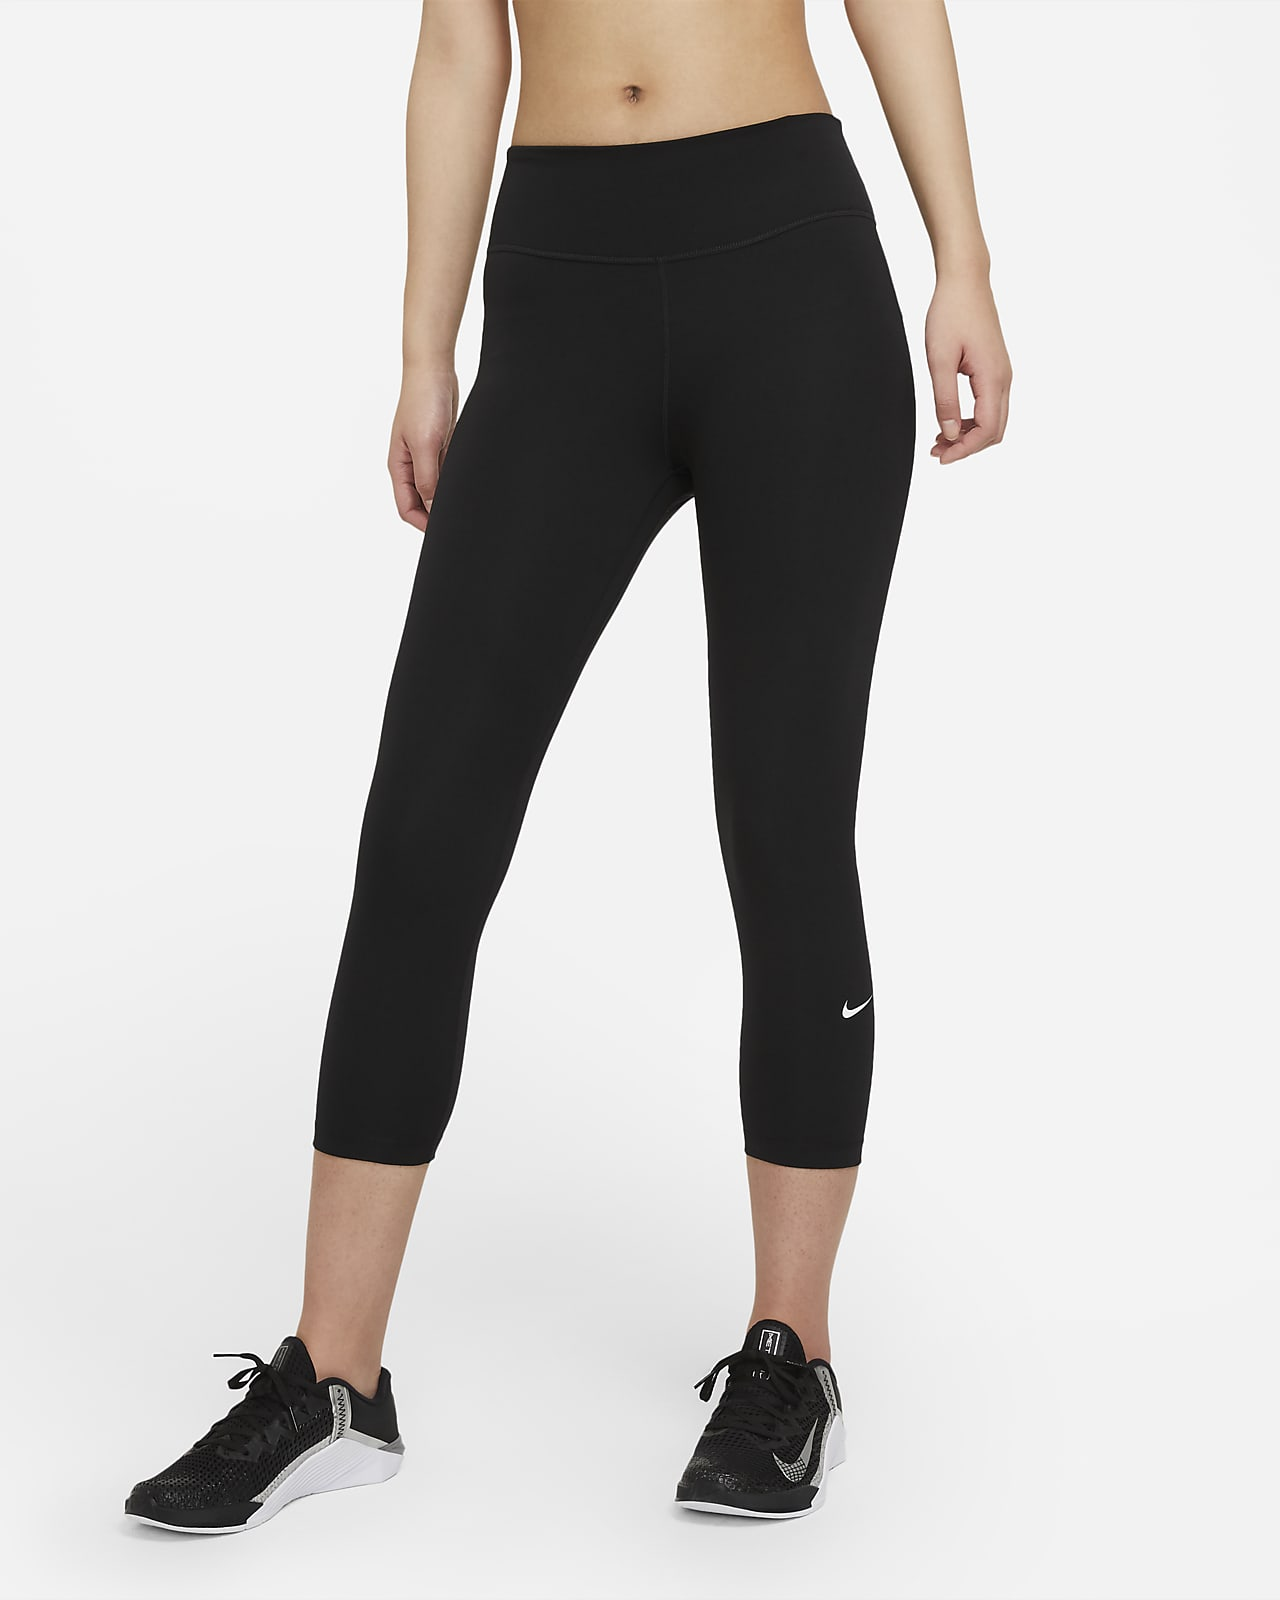 Nike One 女款七分內搭褲